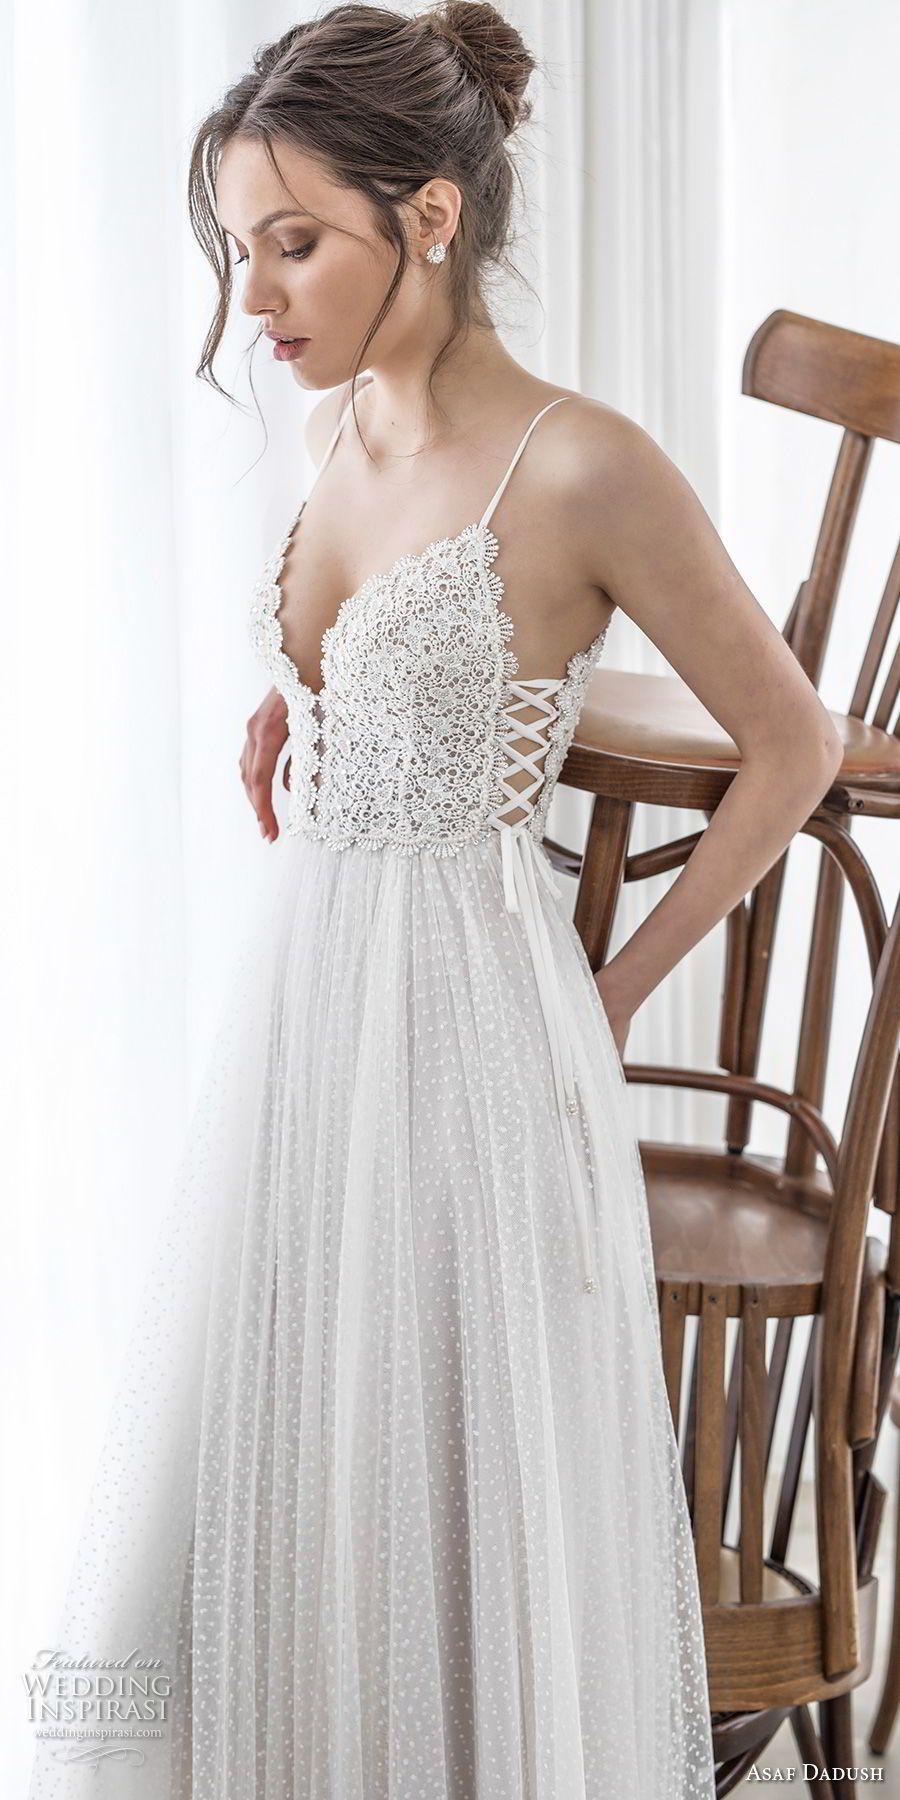 One strap wedding dress  asaf dadush  bridal sleeveless spaghetti strap deep sweetheart